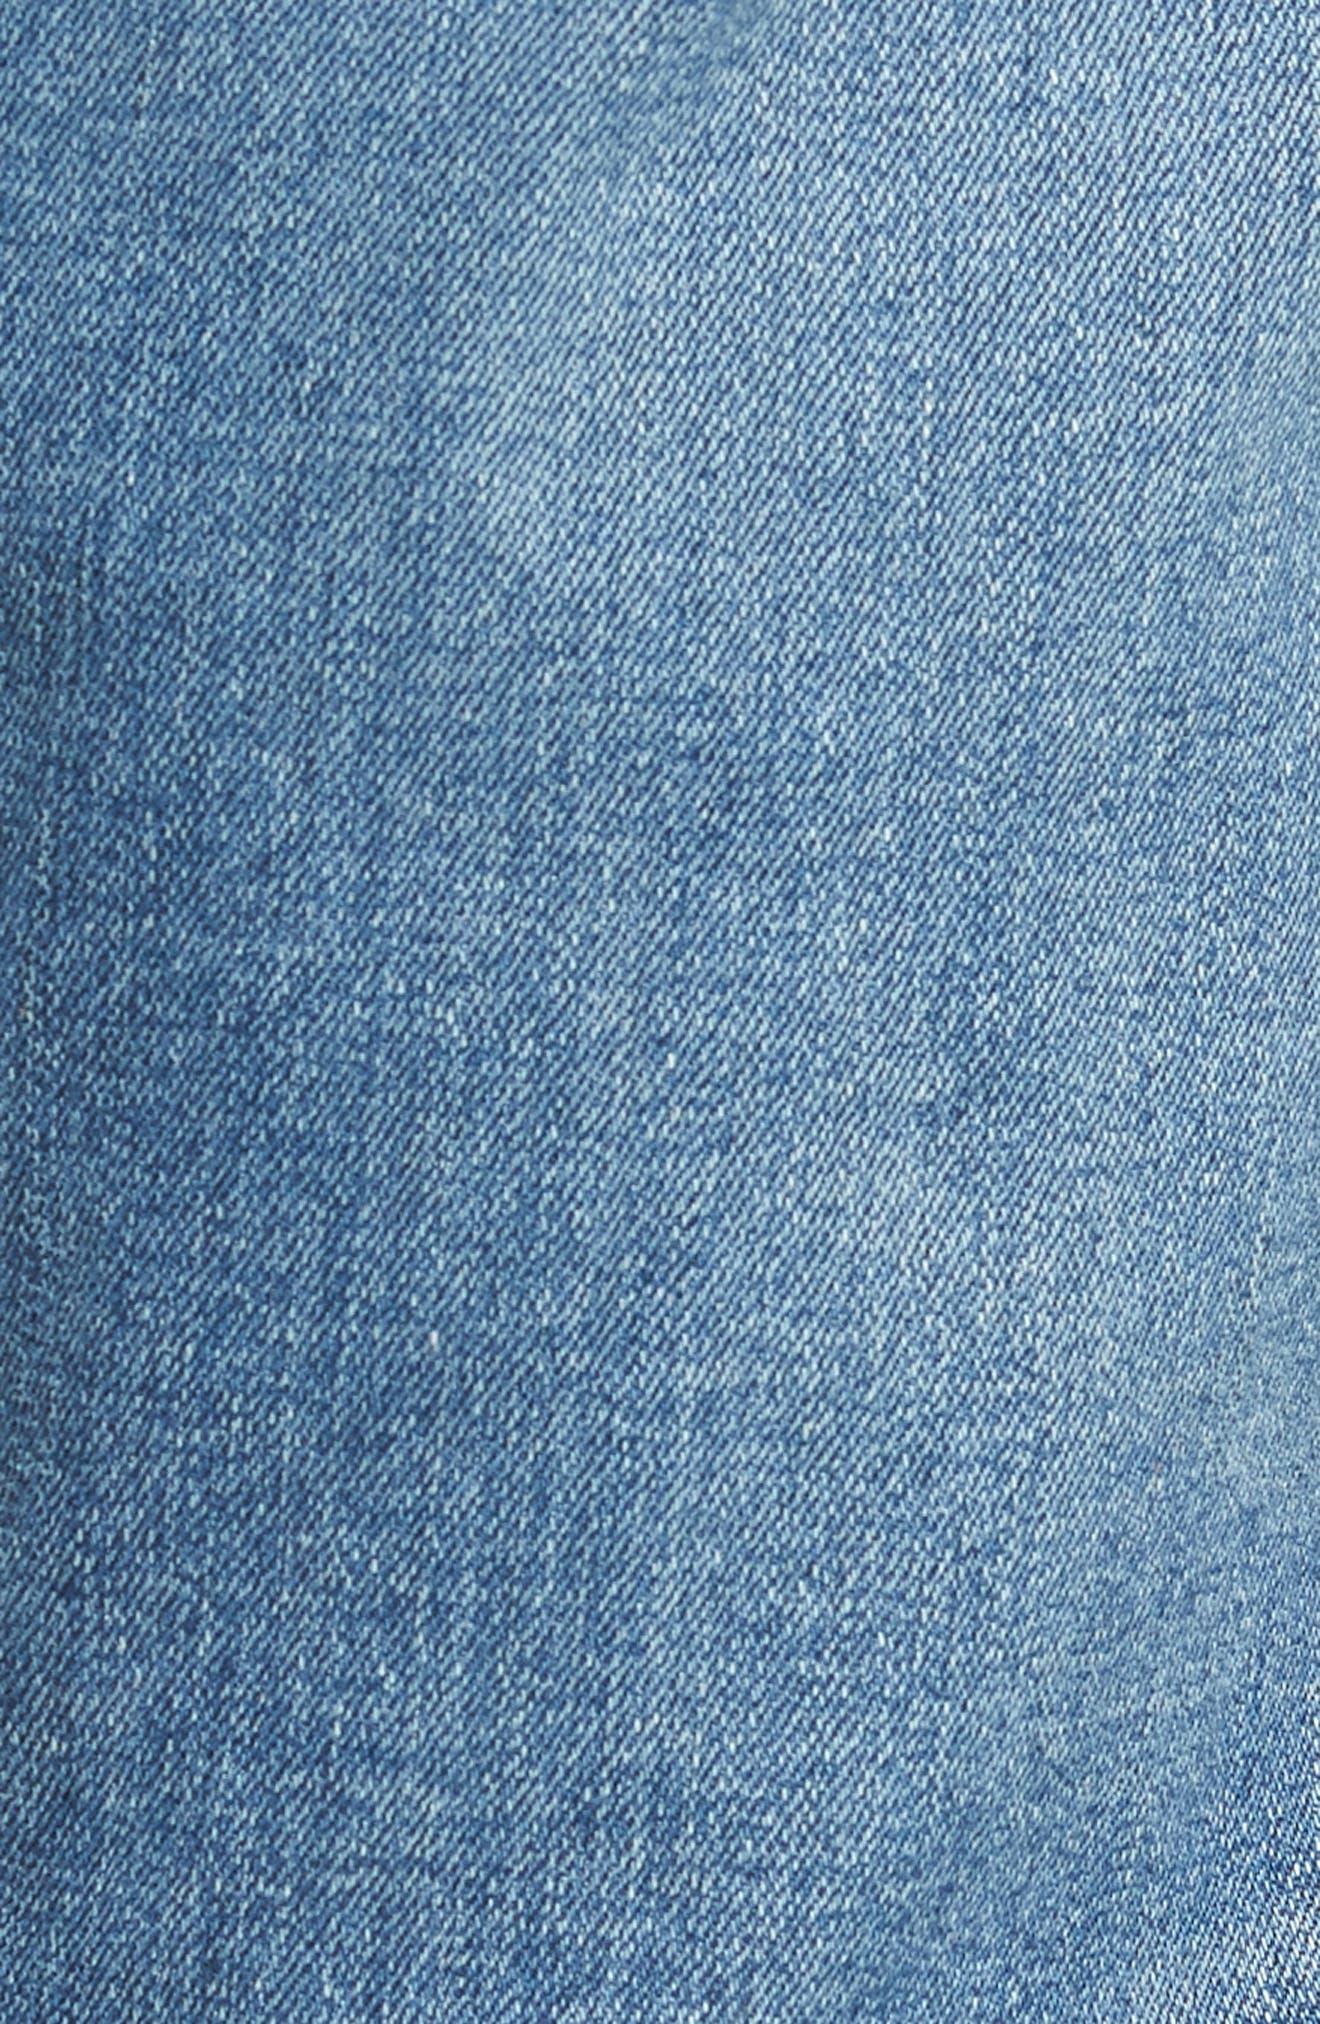 484 Slim Fit Distressed Stretch Jeans,                             Alternate thumbnail 5, color,                             STOCKTON WASH